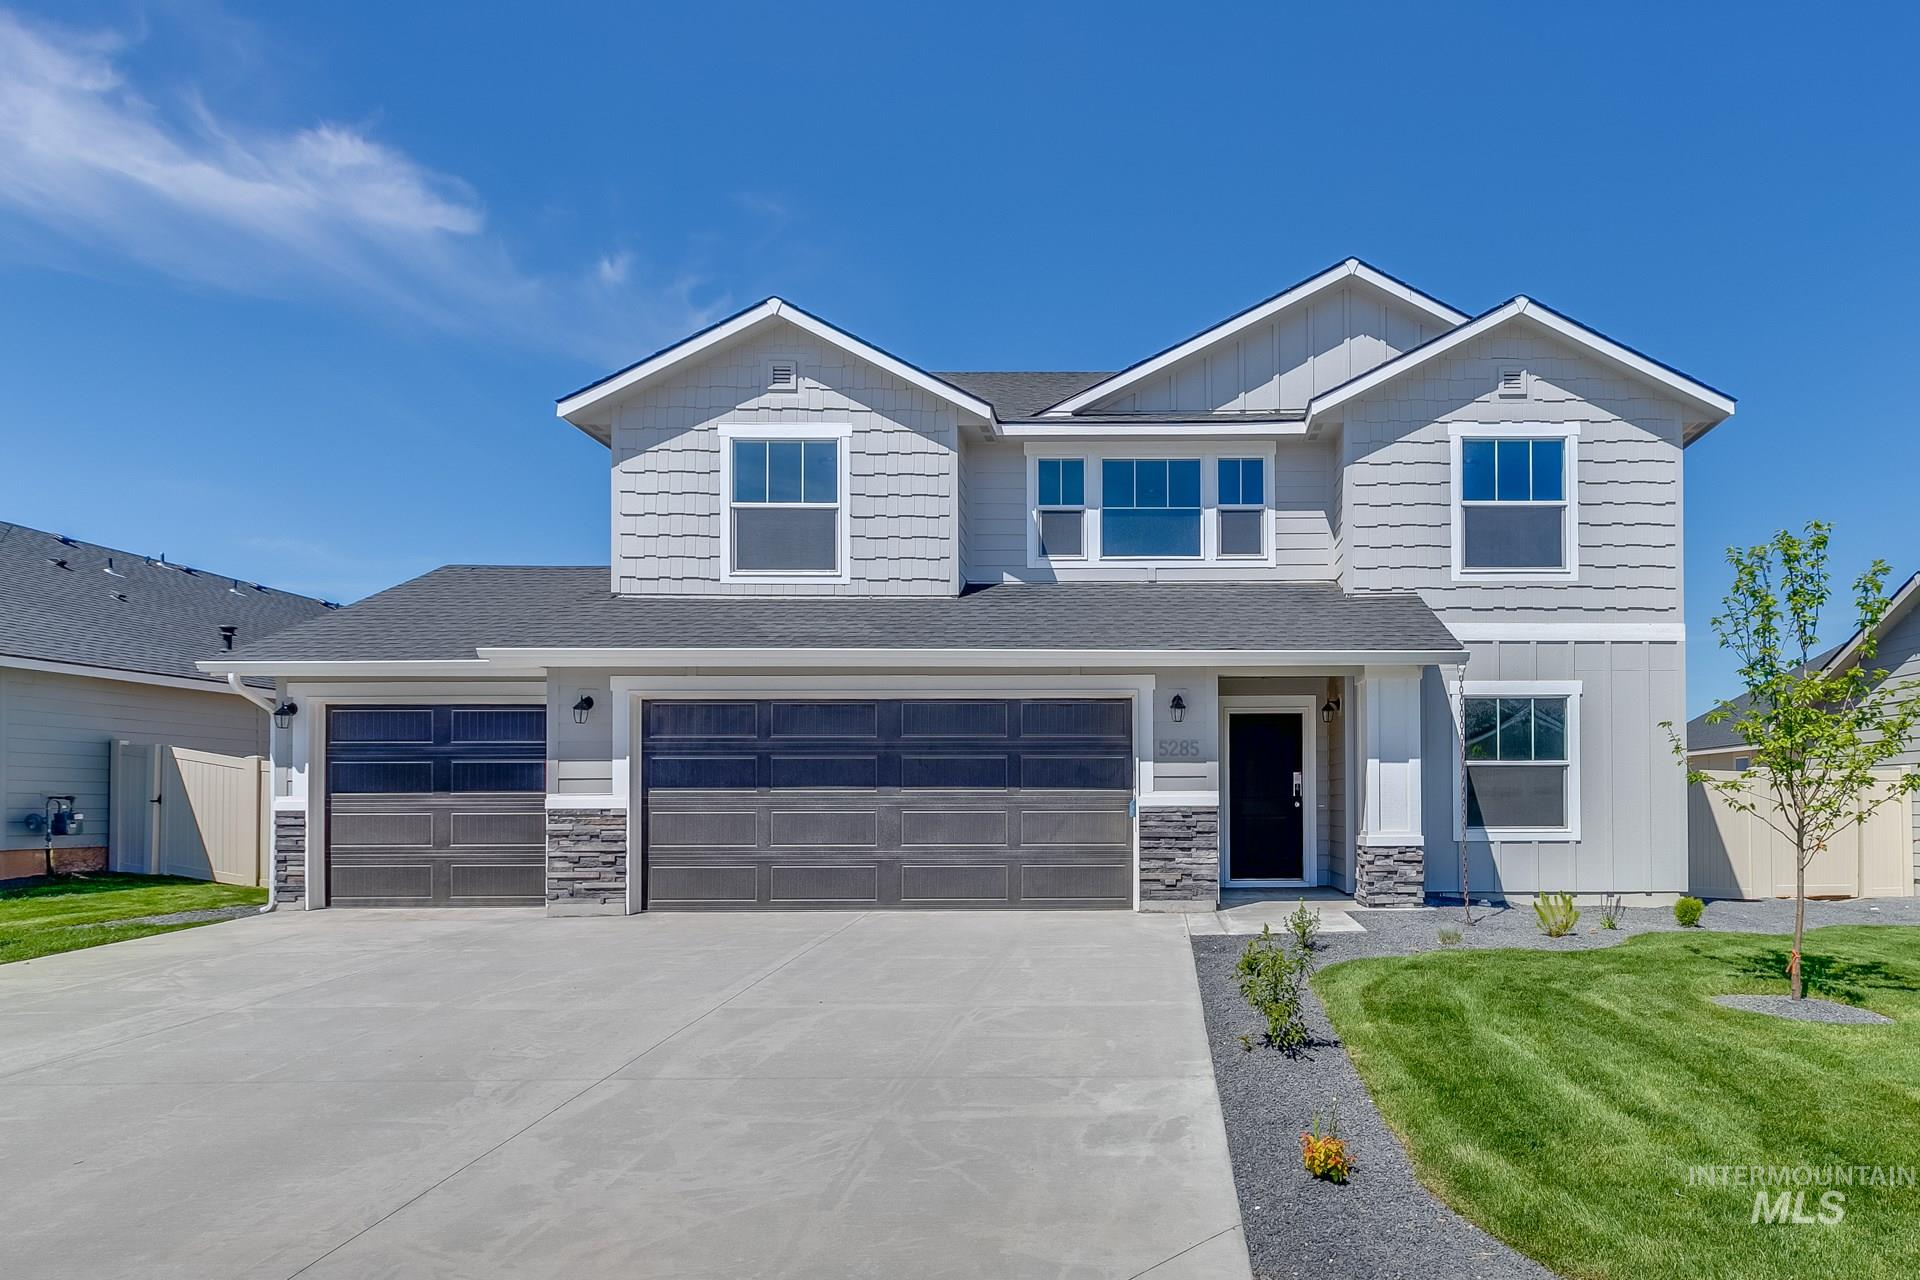 1507 W Nannyberry St Property Photo - Kuna, ID real estate listing